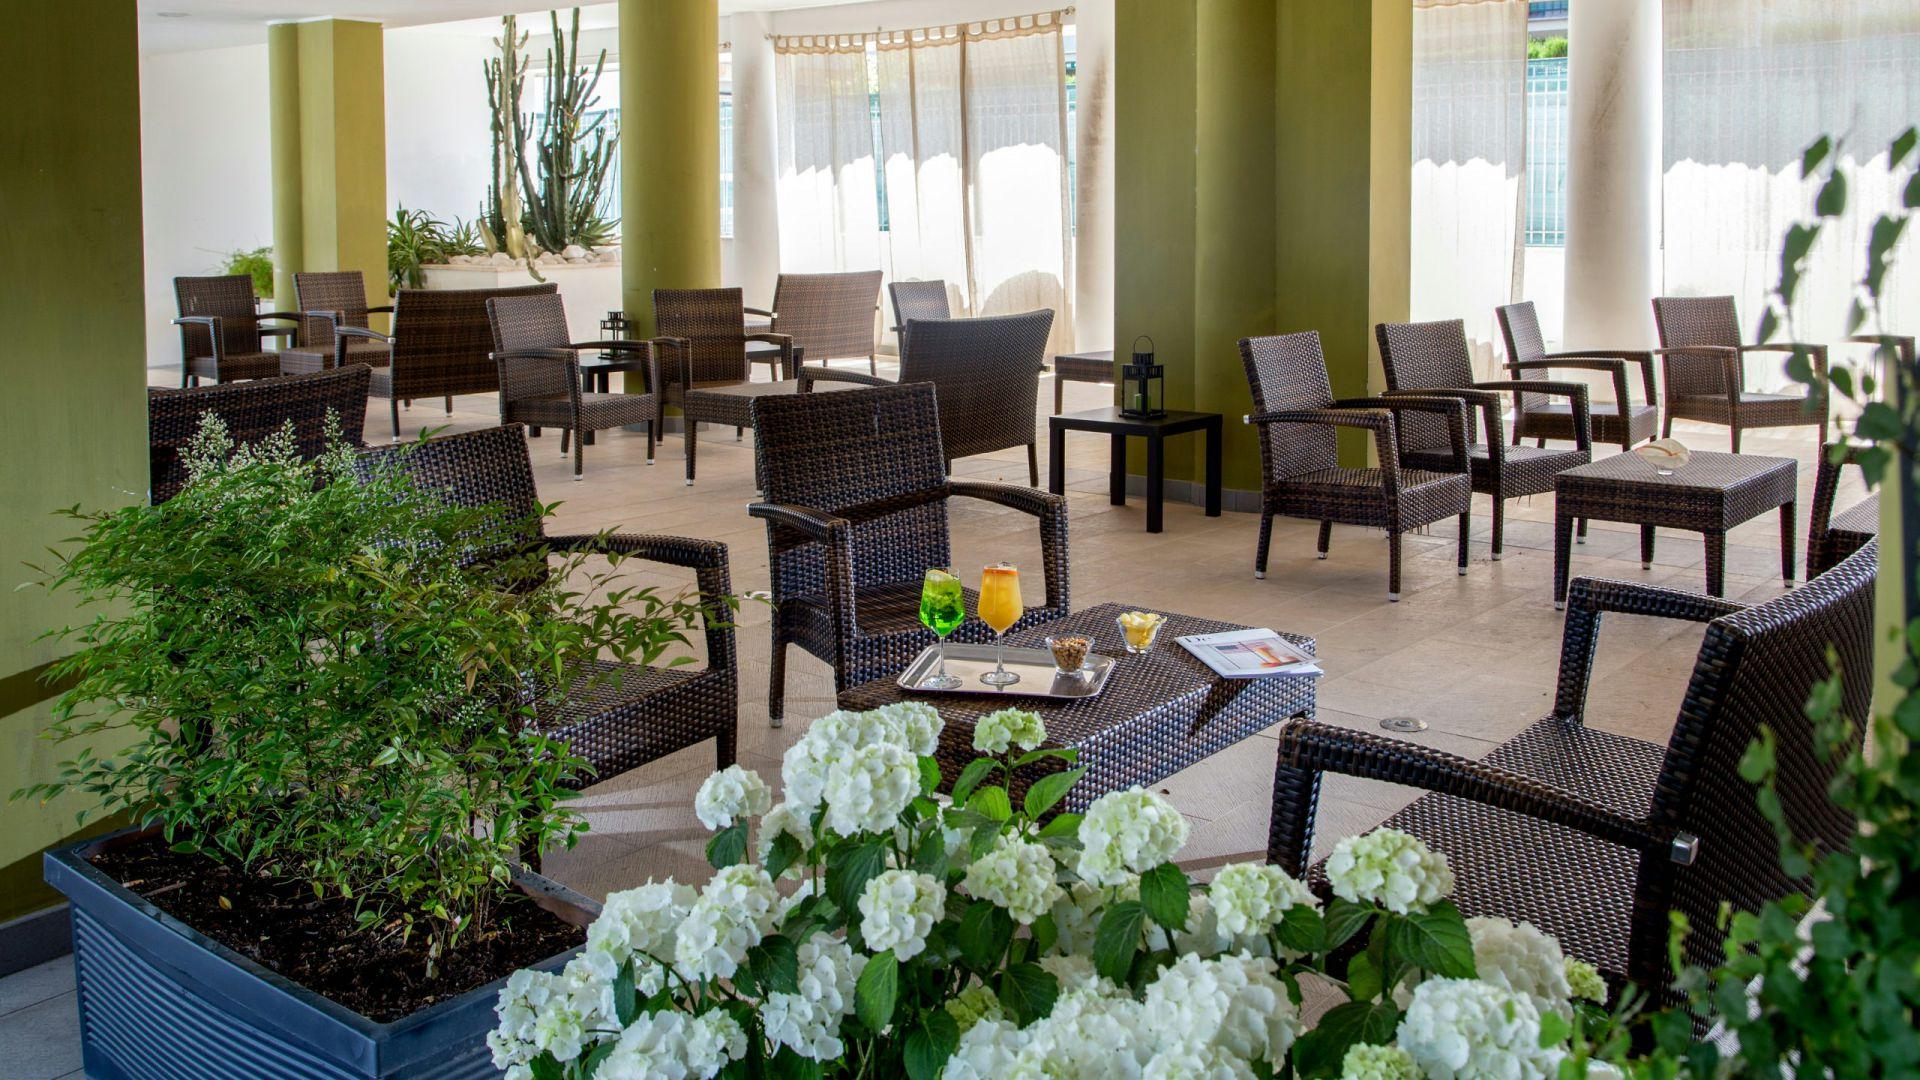 hotel-capannelle-rome-commonareas-12